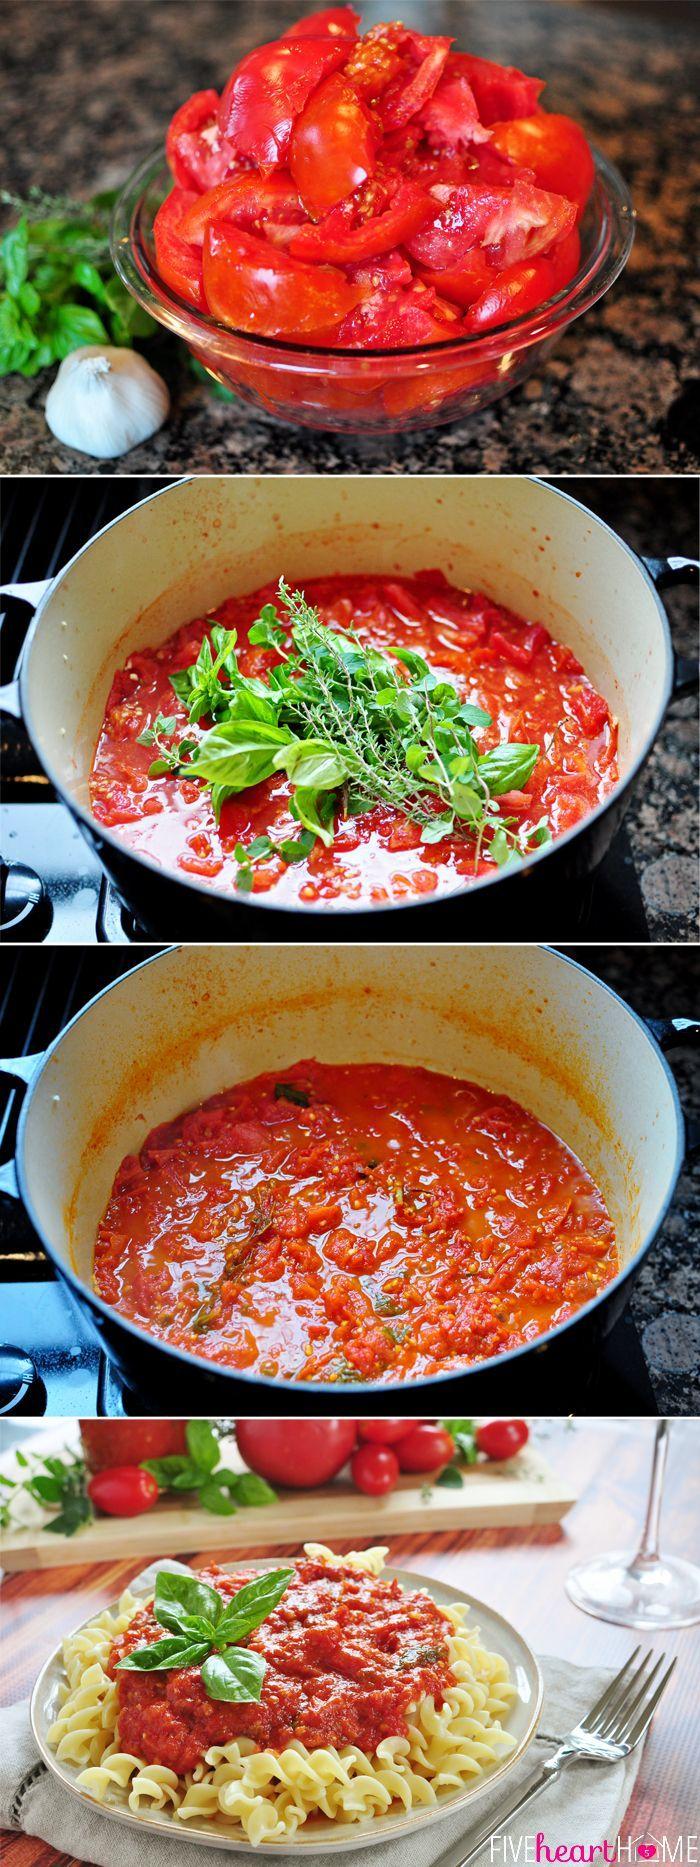 30-Minute Homemade Marinara Sauce #quick #easy #recipes